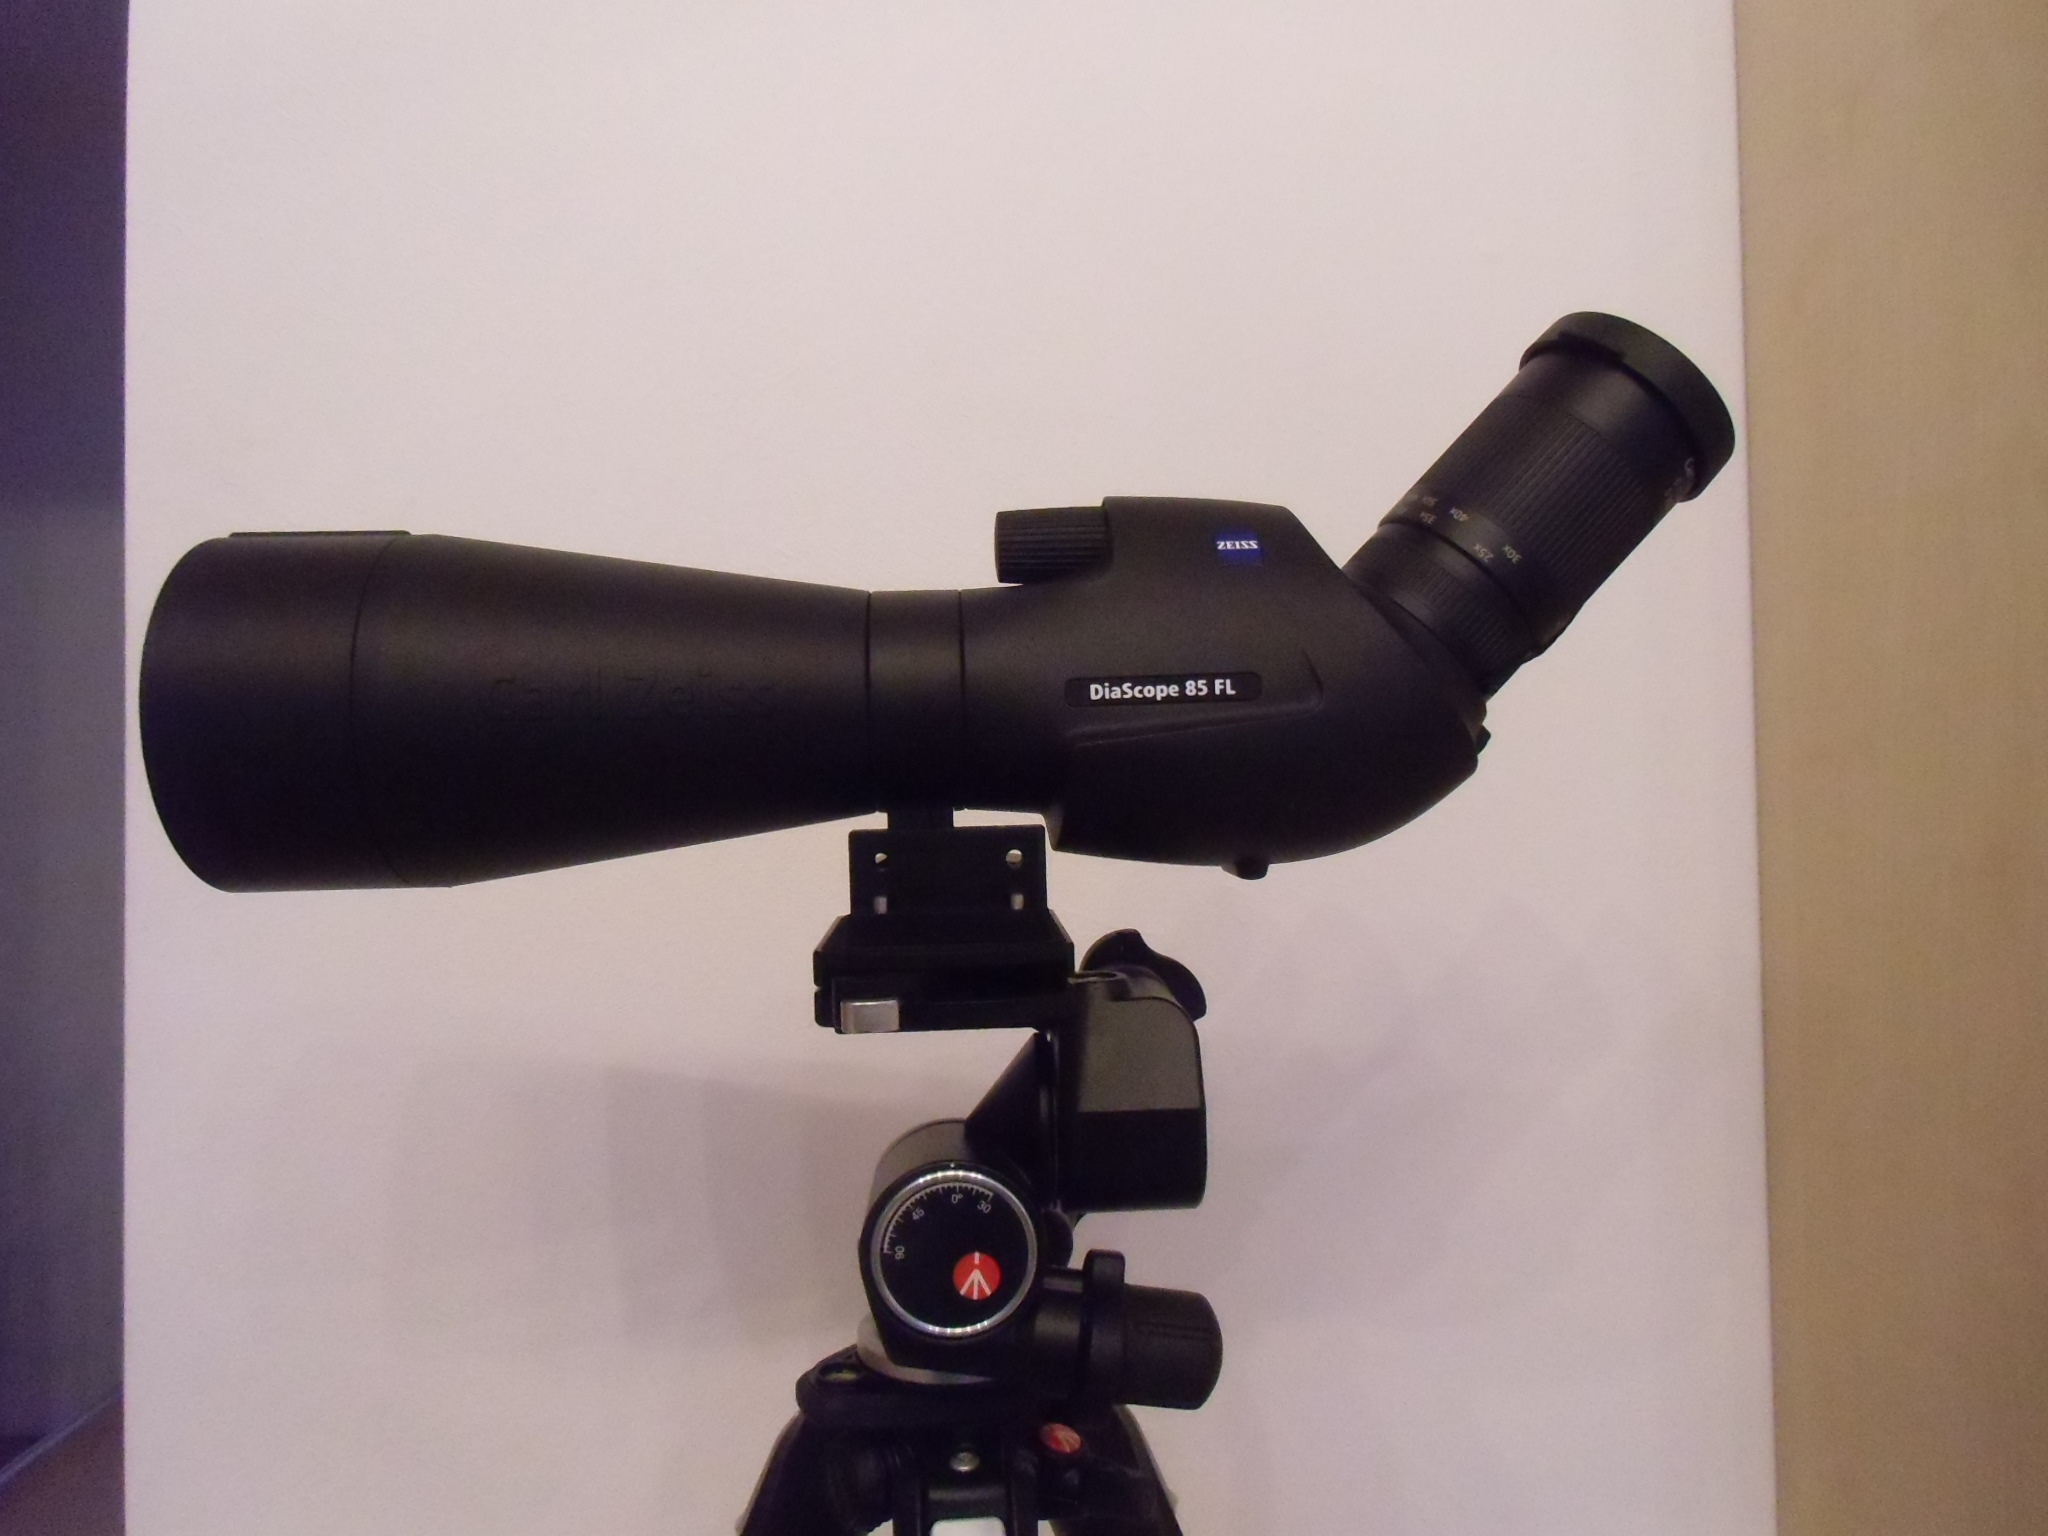 Zeiss Laser Entfernungsmesser : Spektiv zeiss diascope laser entfernungsmesser leica crf